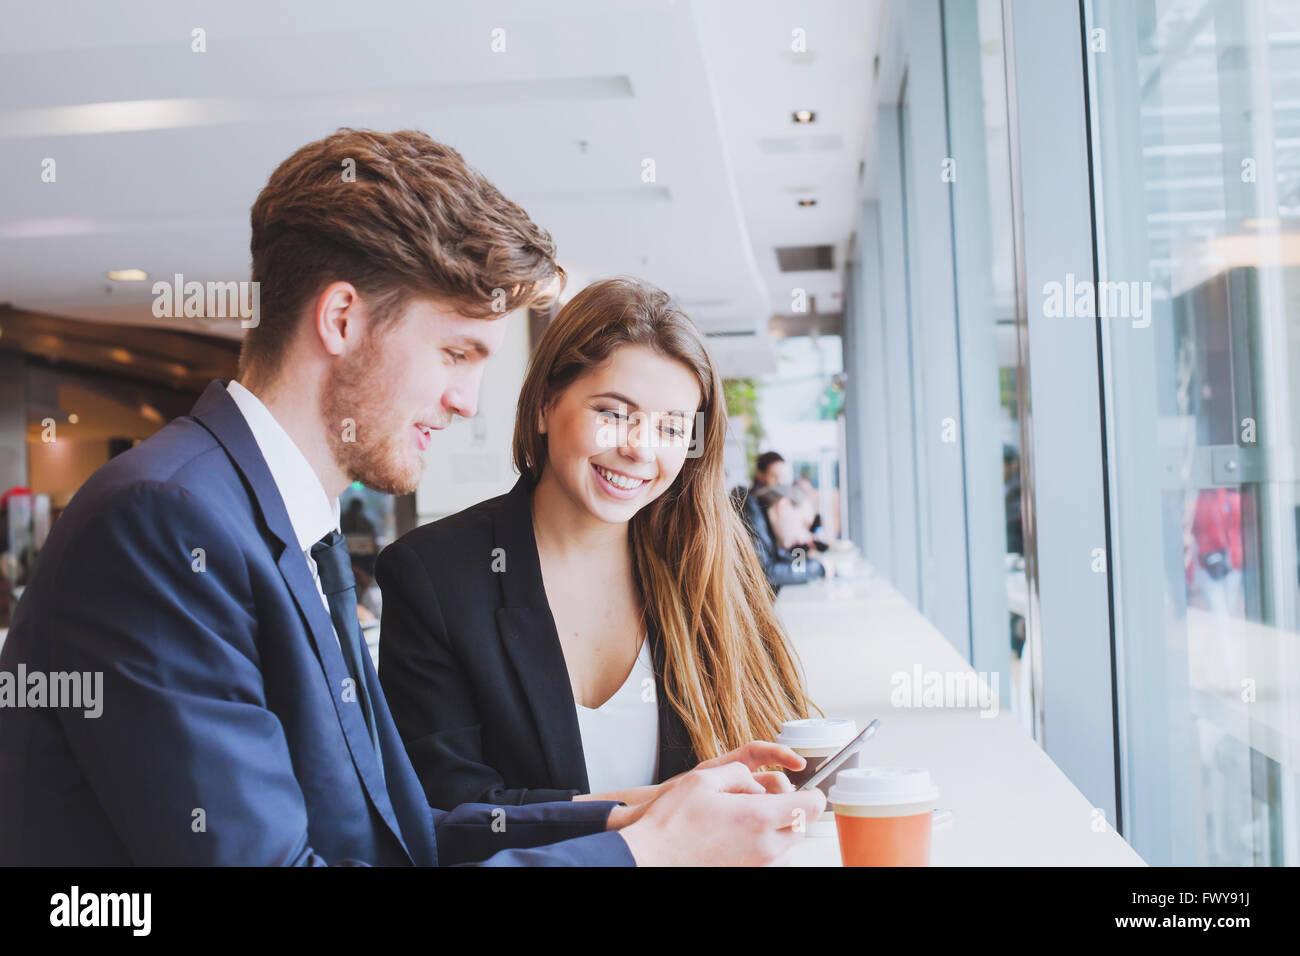 La gente di affari in chat in cafe a pranzo o Pausa caffè Immagini Stock